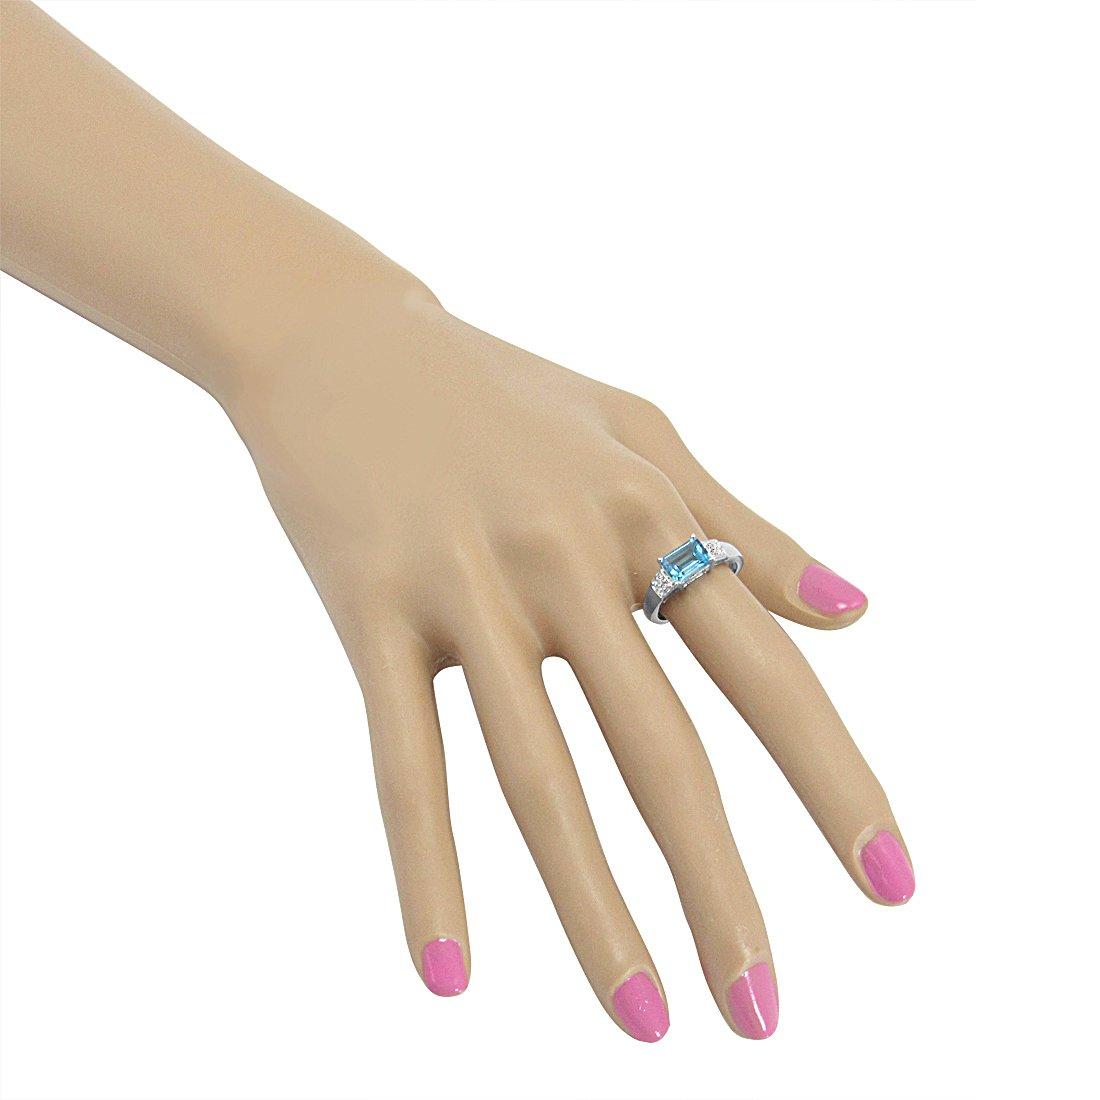 2ct tgw Sizes 5-8 Sterling Silver Emerald Cut Swiss Blue Topaz and Diamond Ring